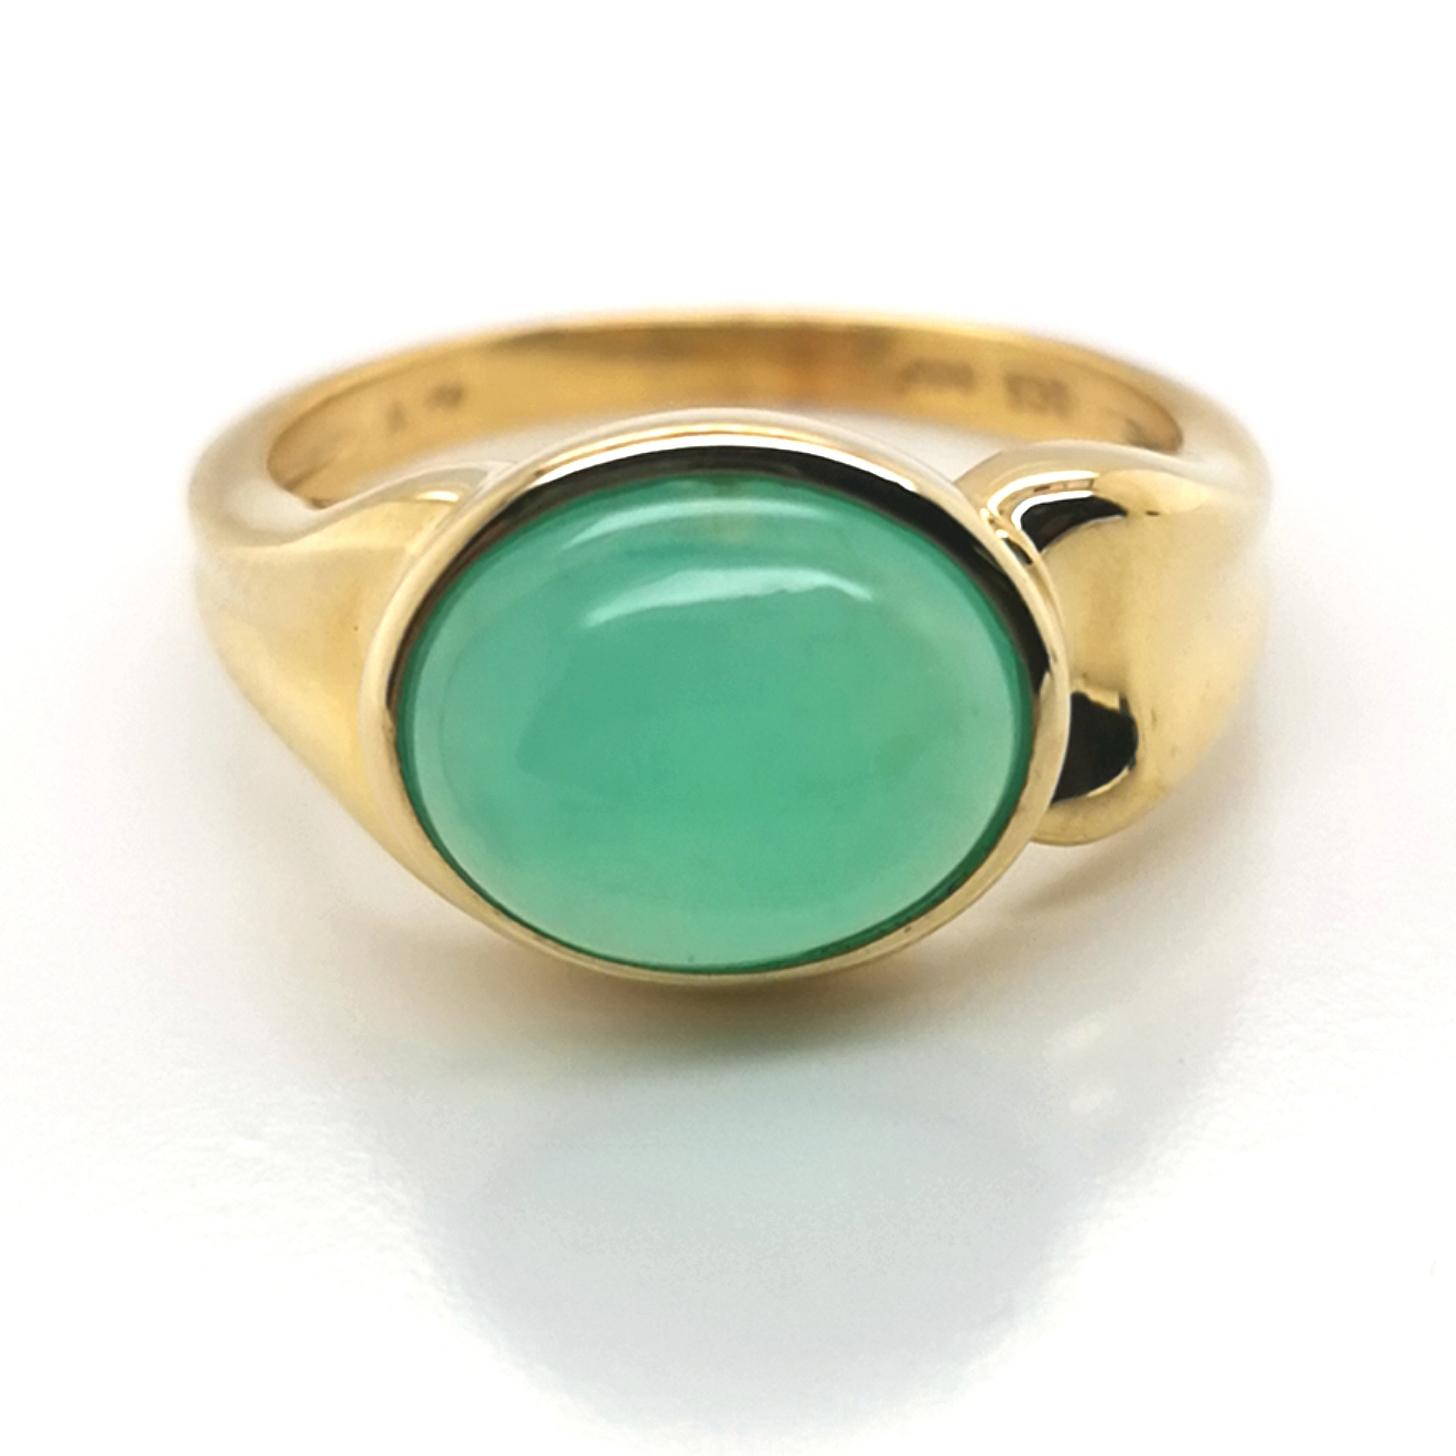 Peruanischer Opal, grün, ca. 3 ct Edelstein, 925/000 Silber vergoldet, Ring, Sogni d´oro